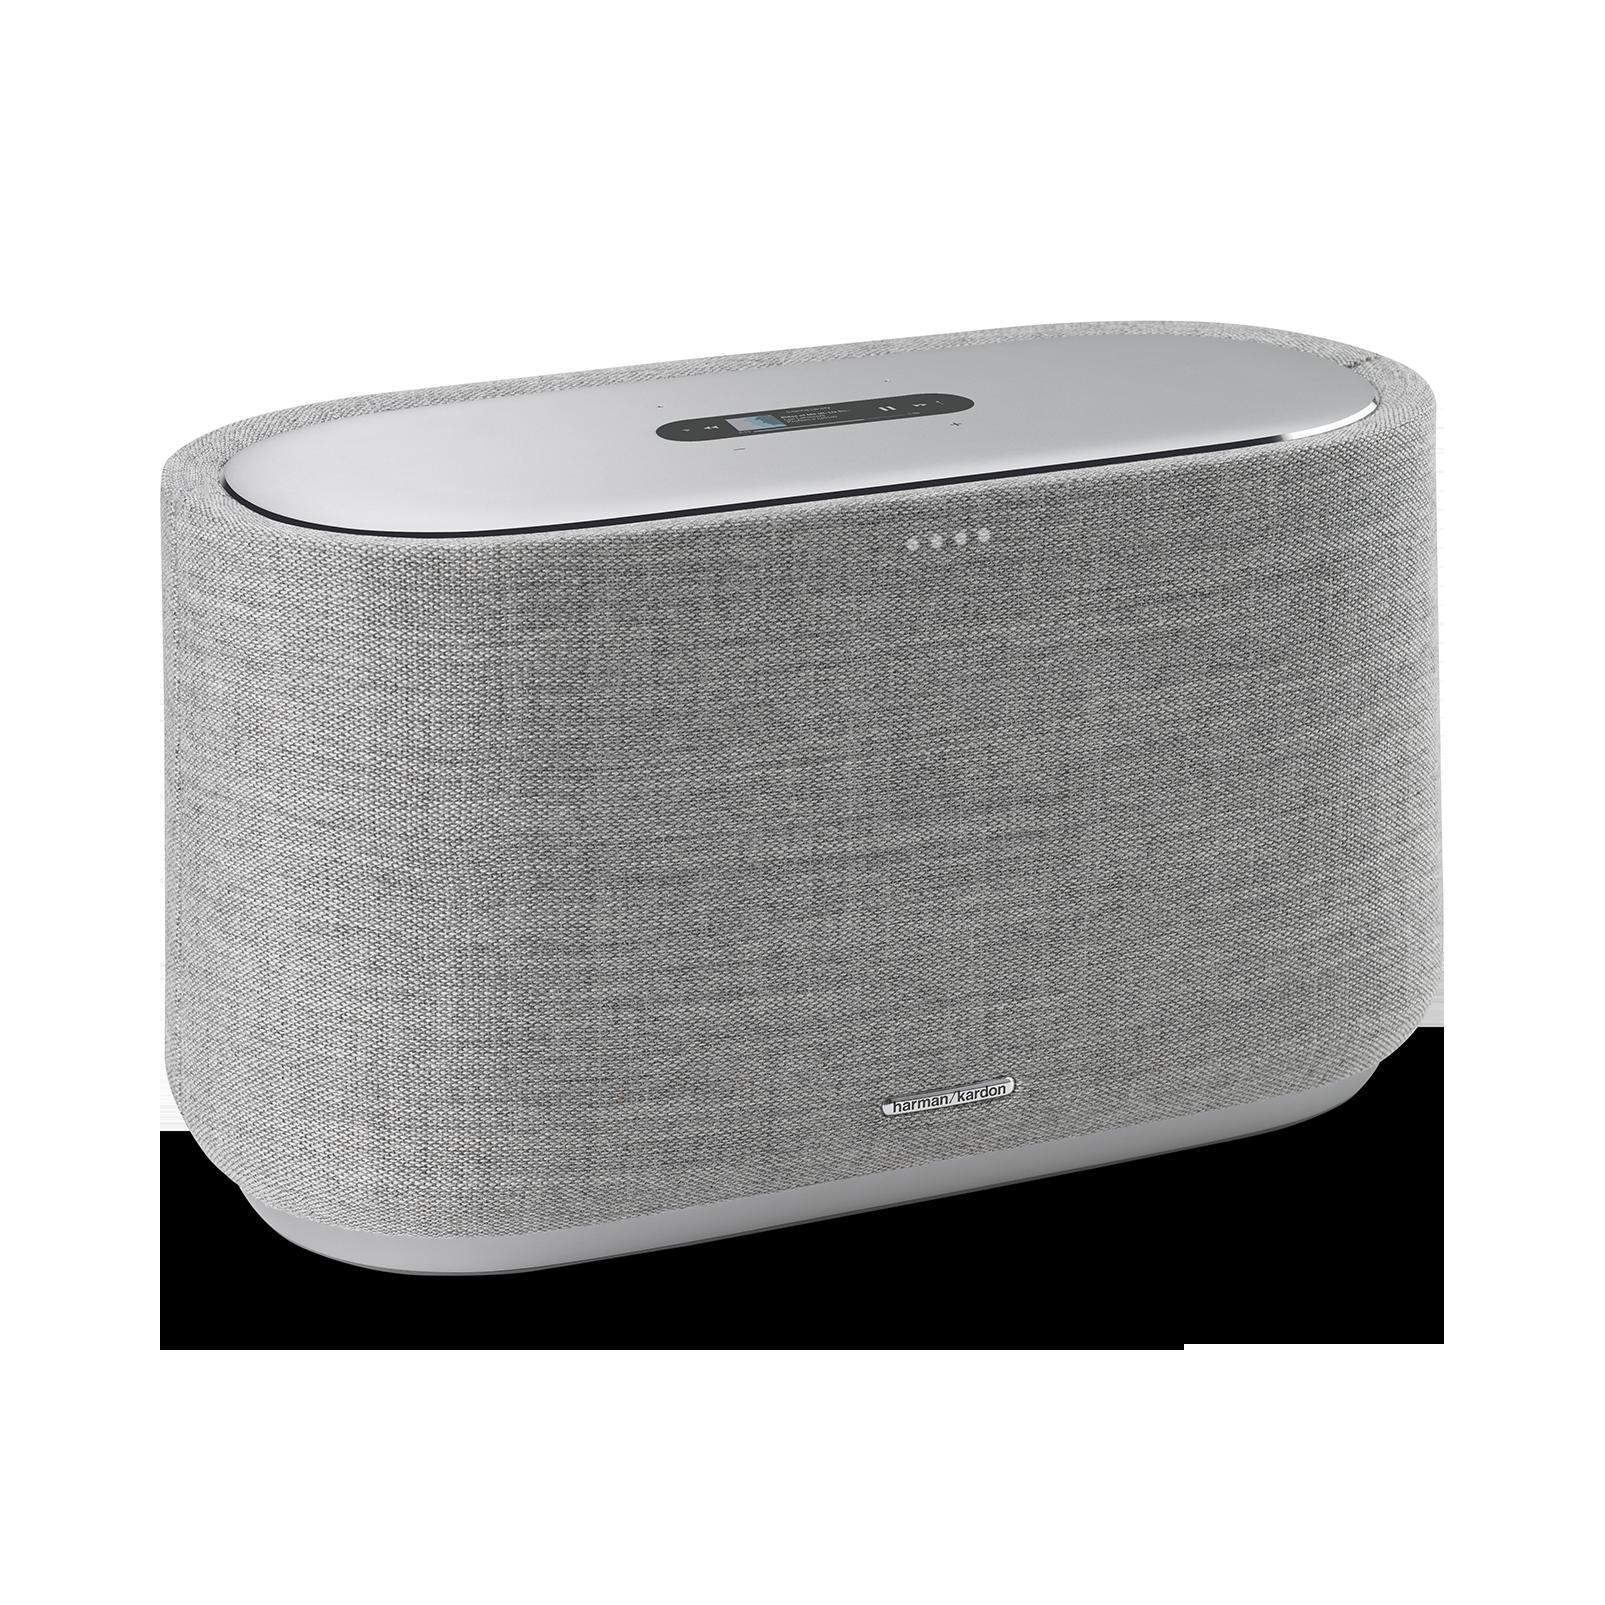 Harman Kardon Citation 500 - Grey - Large Tabletop Smart Home Loudspeaker System - Hero